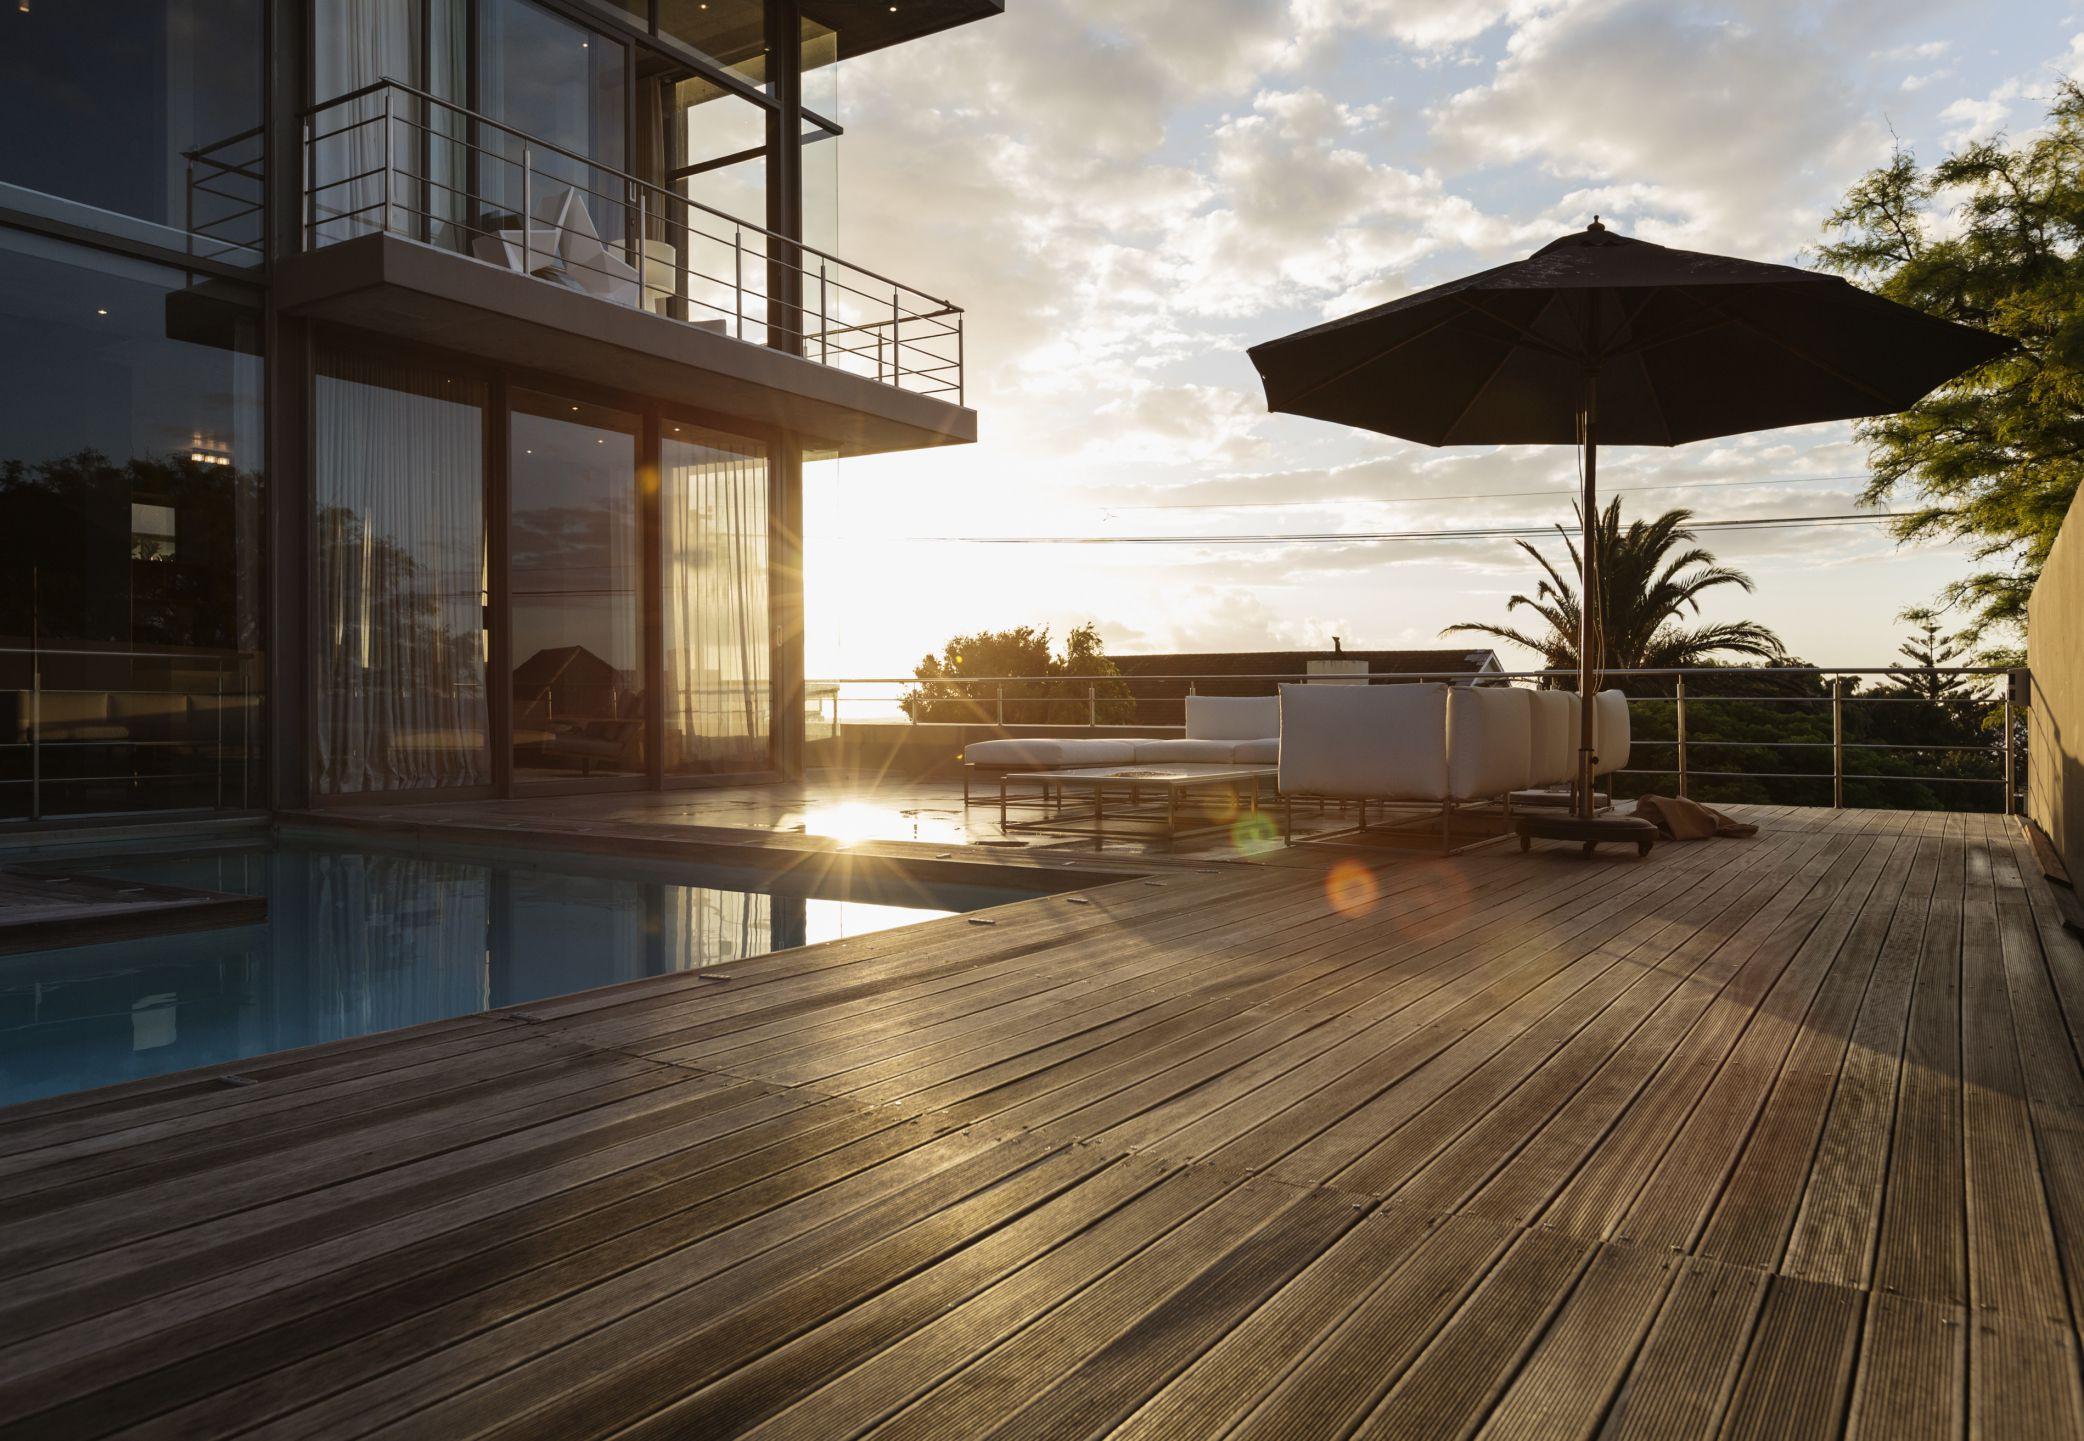 hardwood floor refinishing utah county of deck code deck guardrail height guards and balusters for house with deck 483599469 56a4a12d5f9b58b7d0d7e5c0